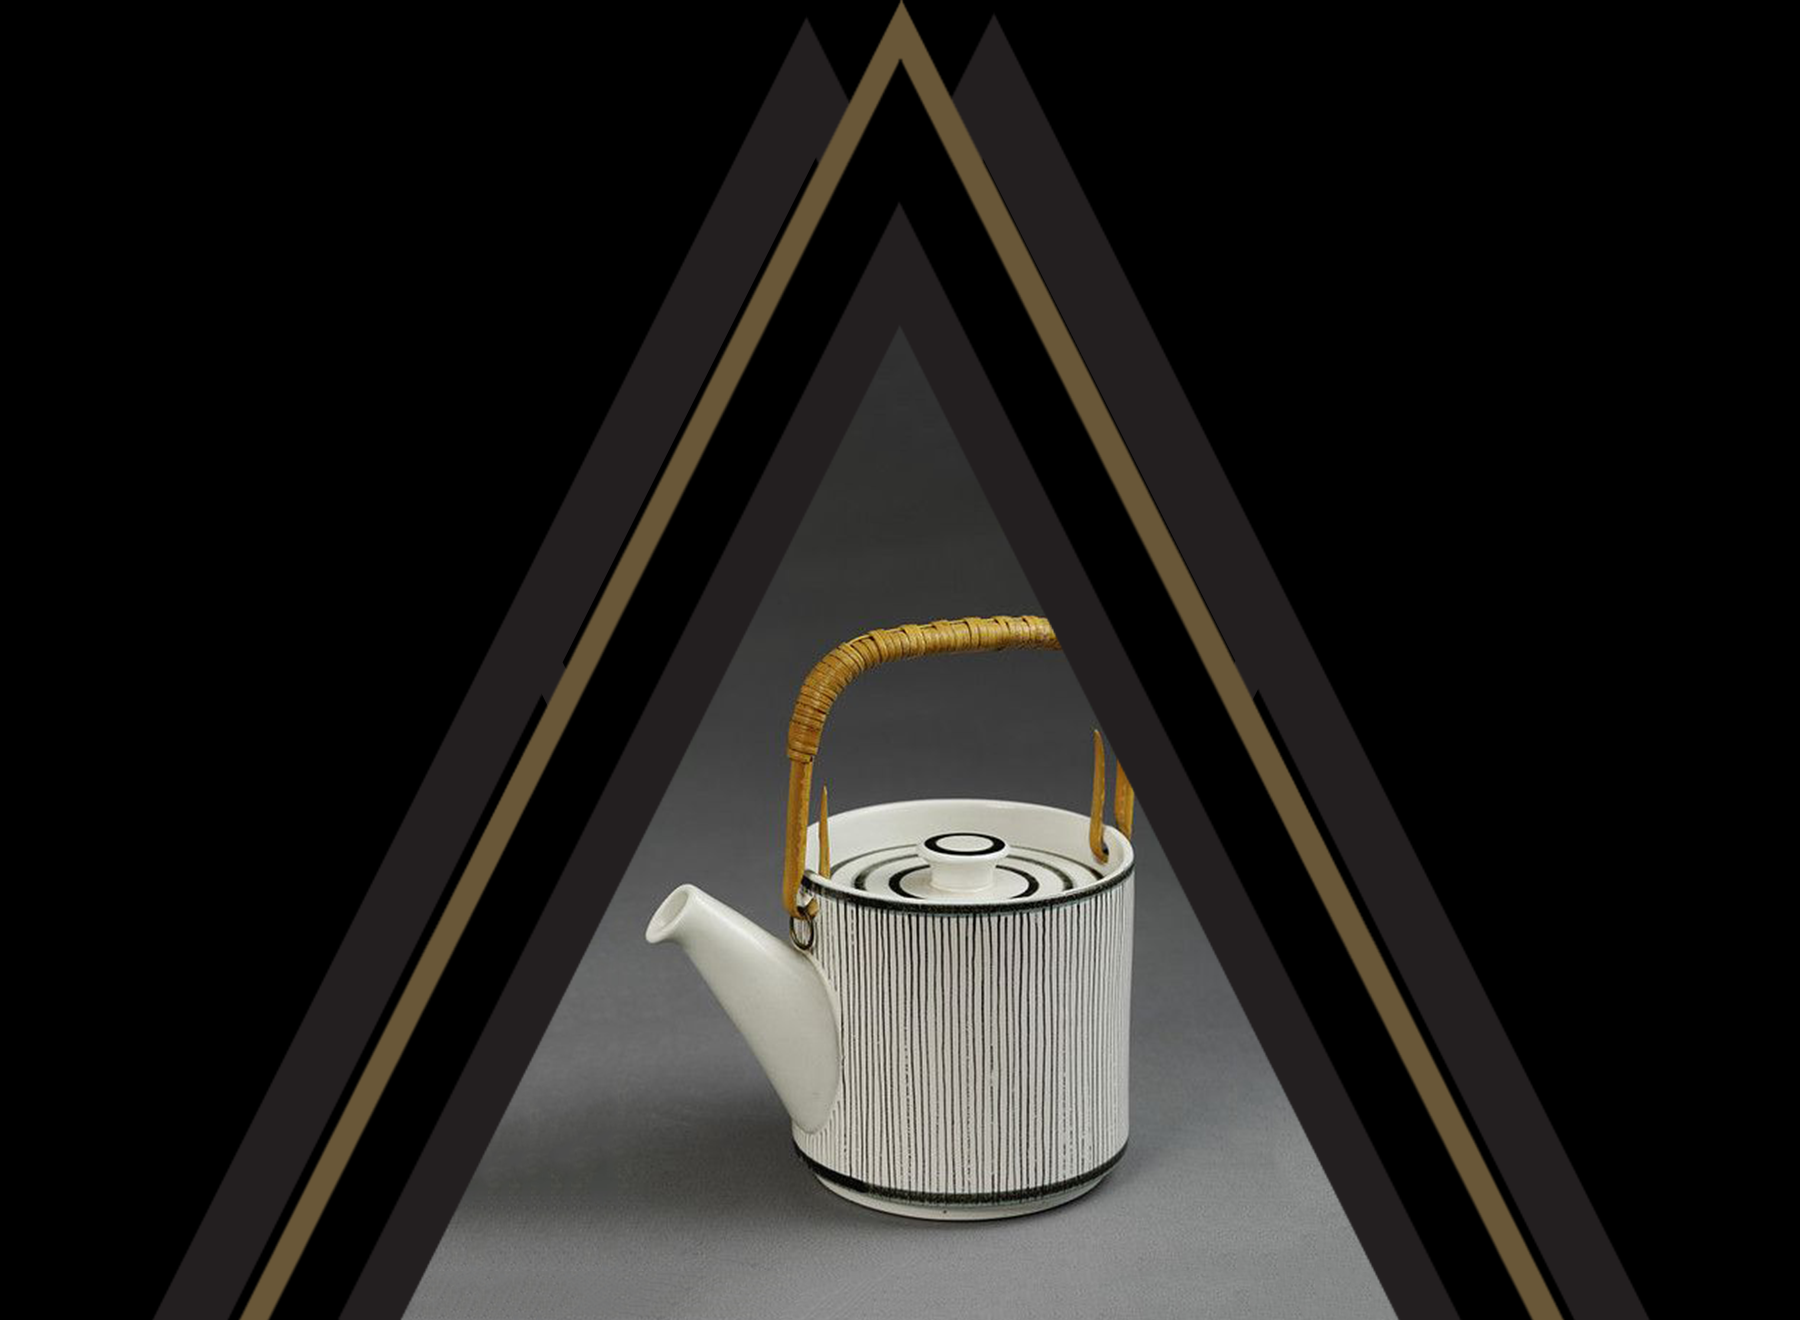 raoul & simone • PATTERNS ON OBJECTS BOARD    Tea Pot Design by Stig Lindberg